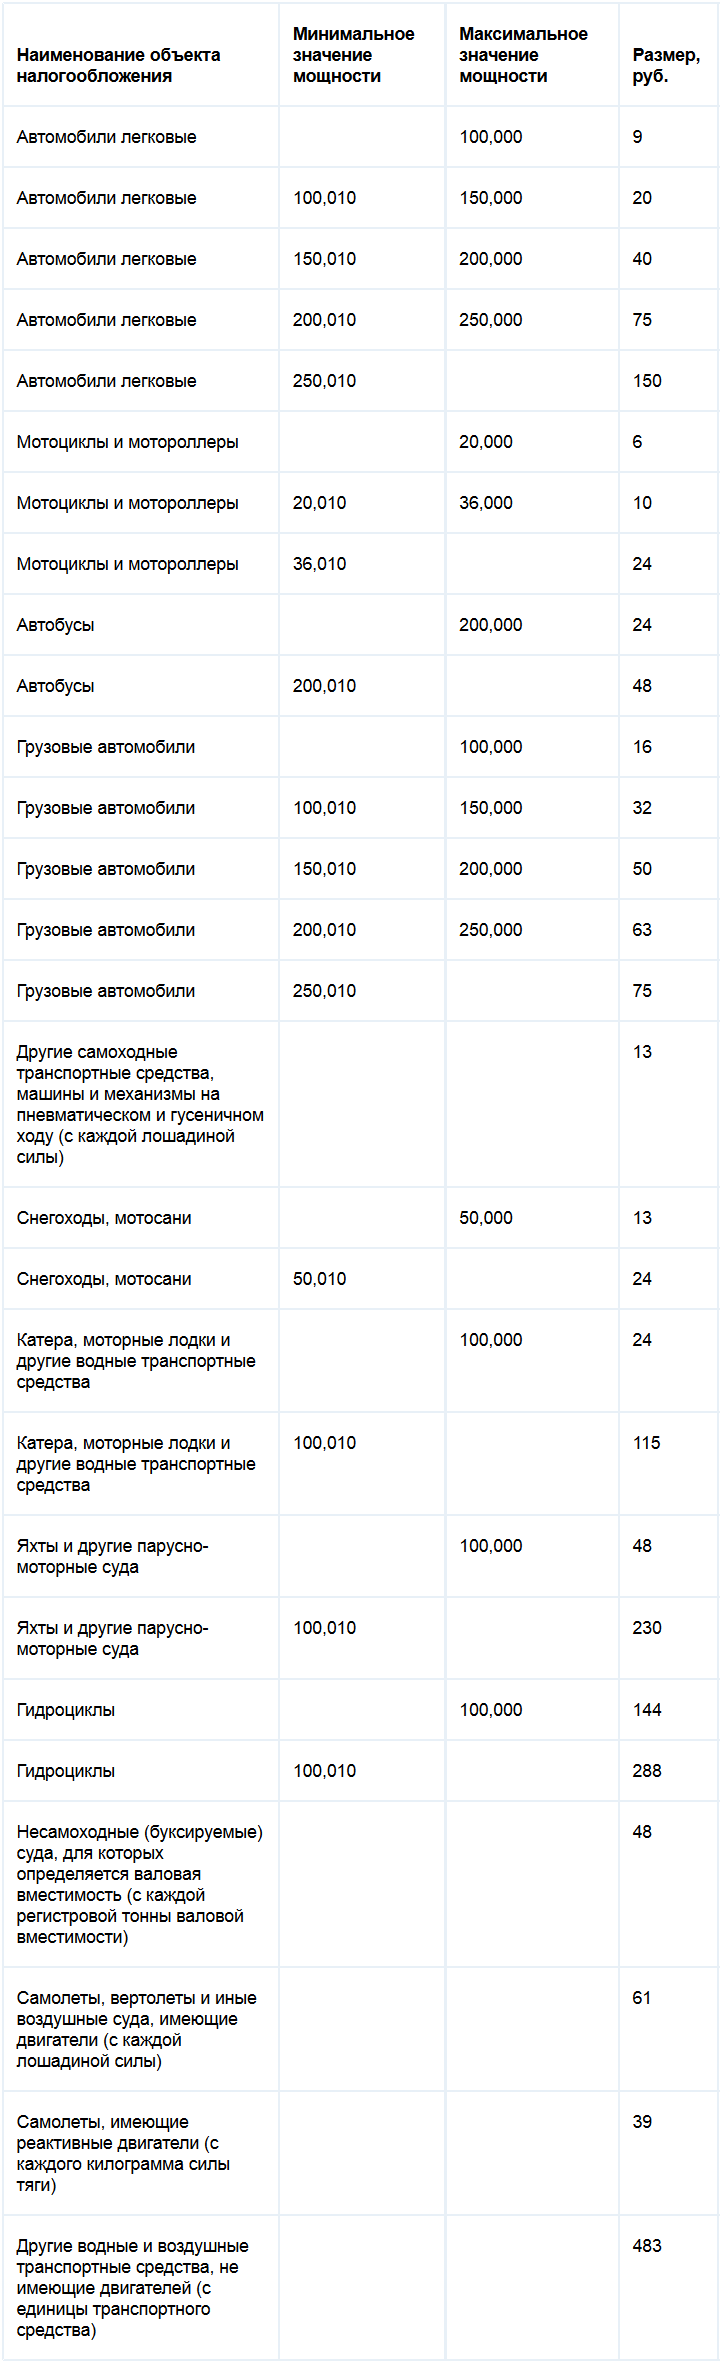 Ставка транспортного налога в Волгоградской области